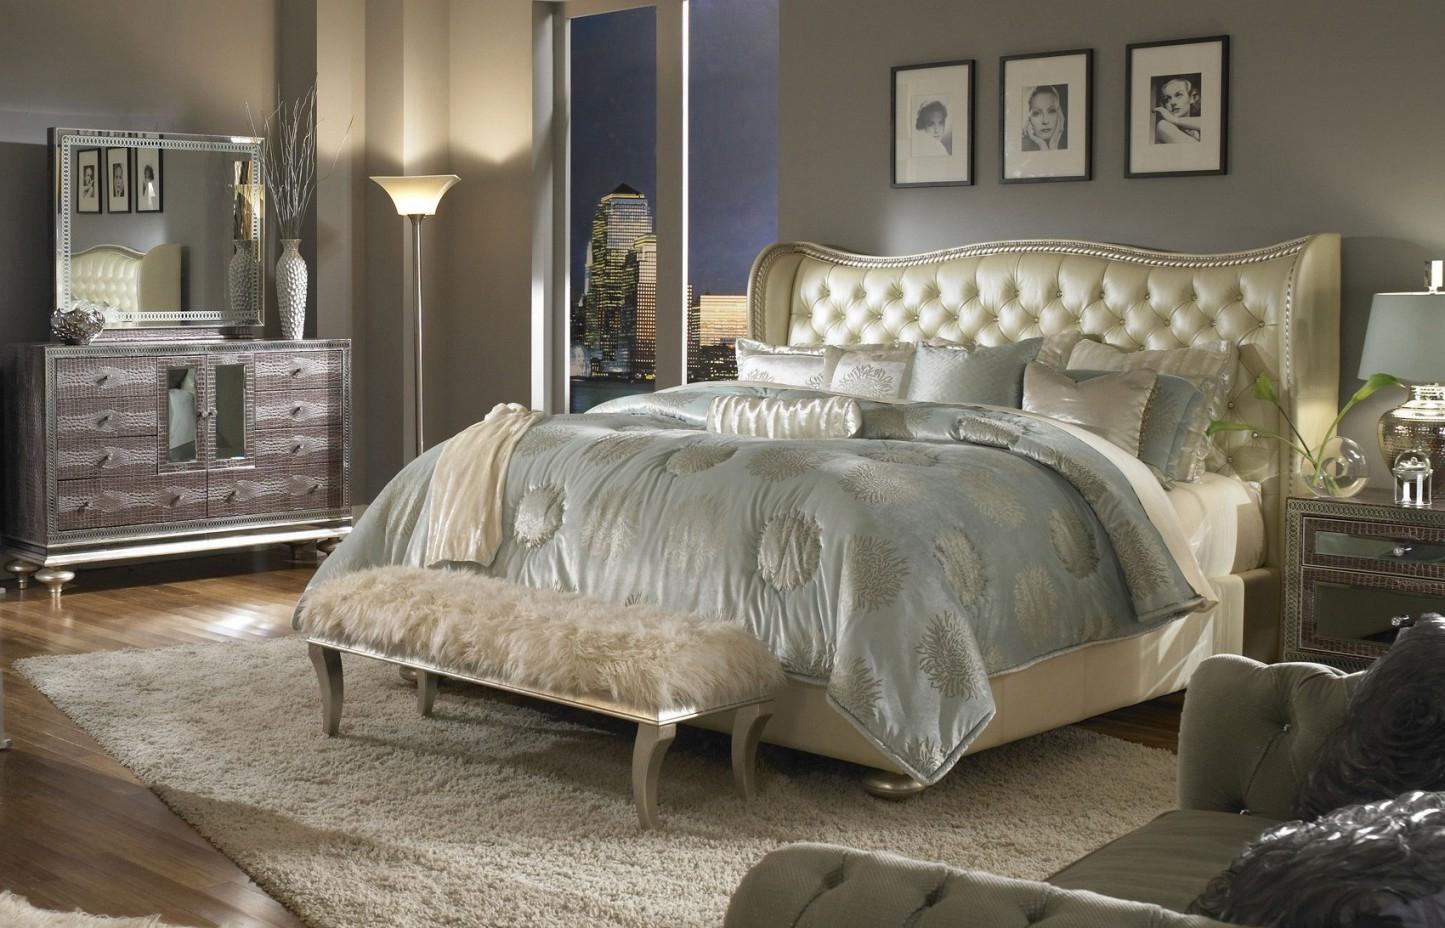 bedroom decorating ideas mirrored furniture photo - 2